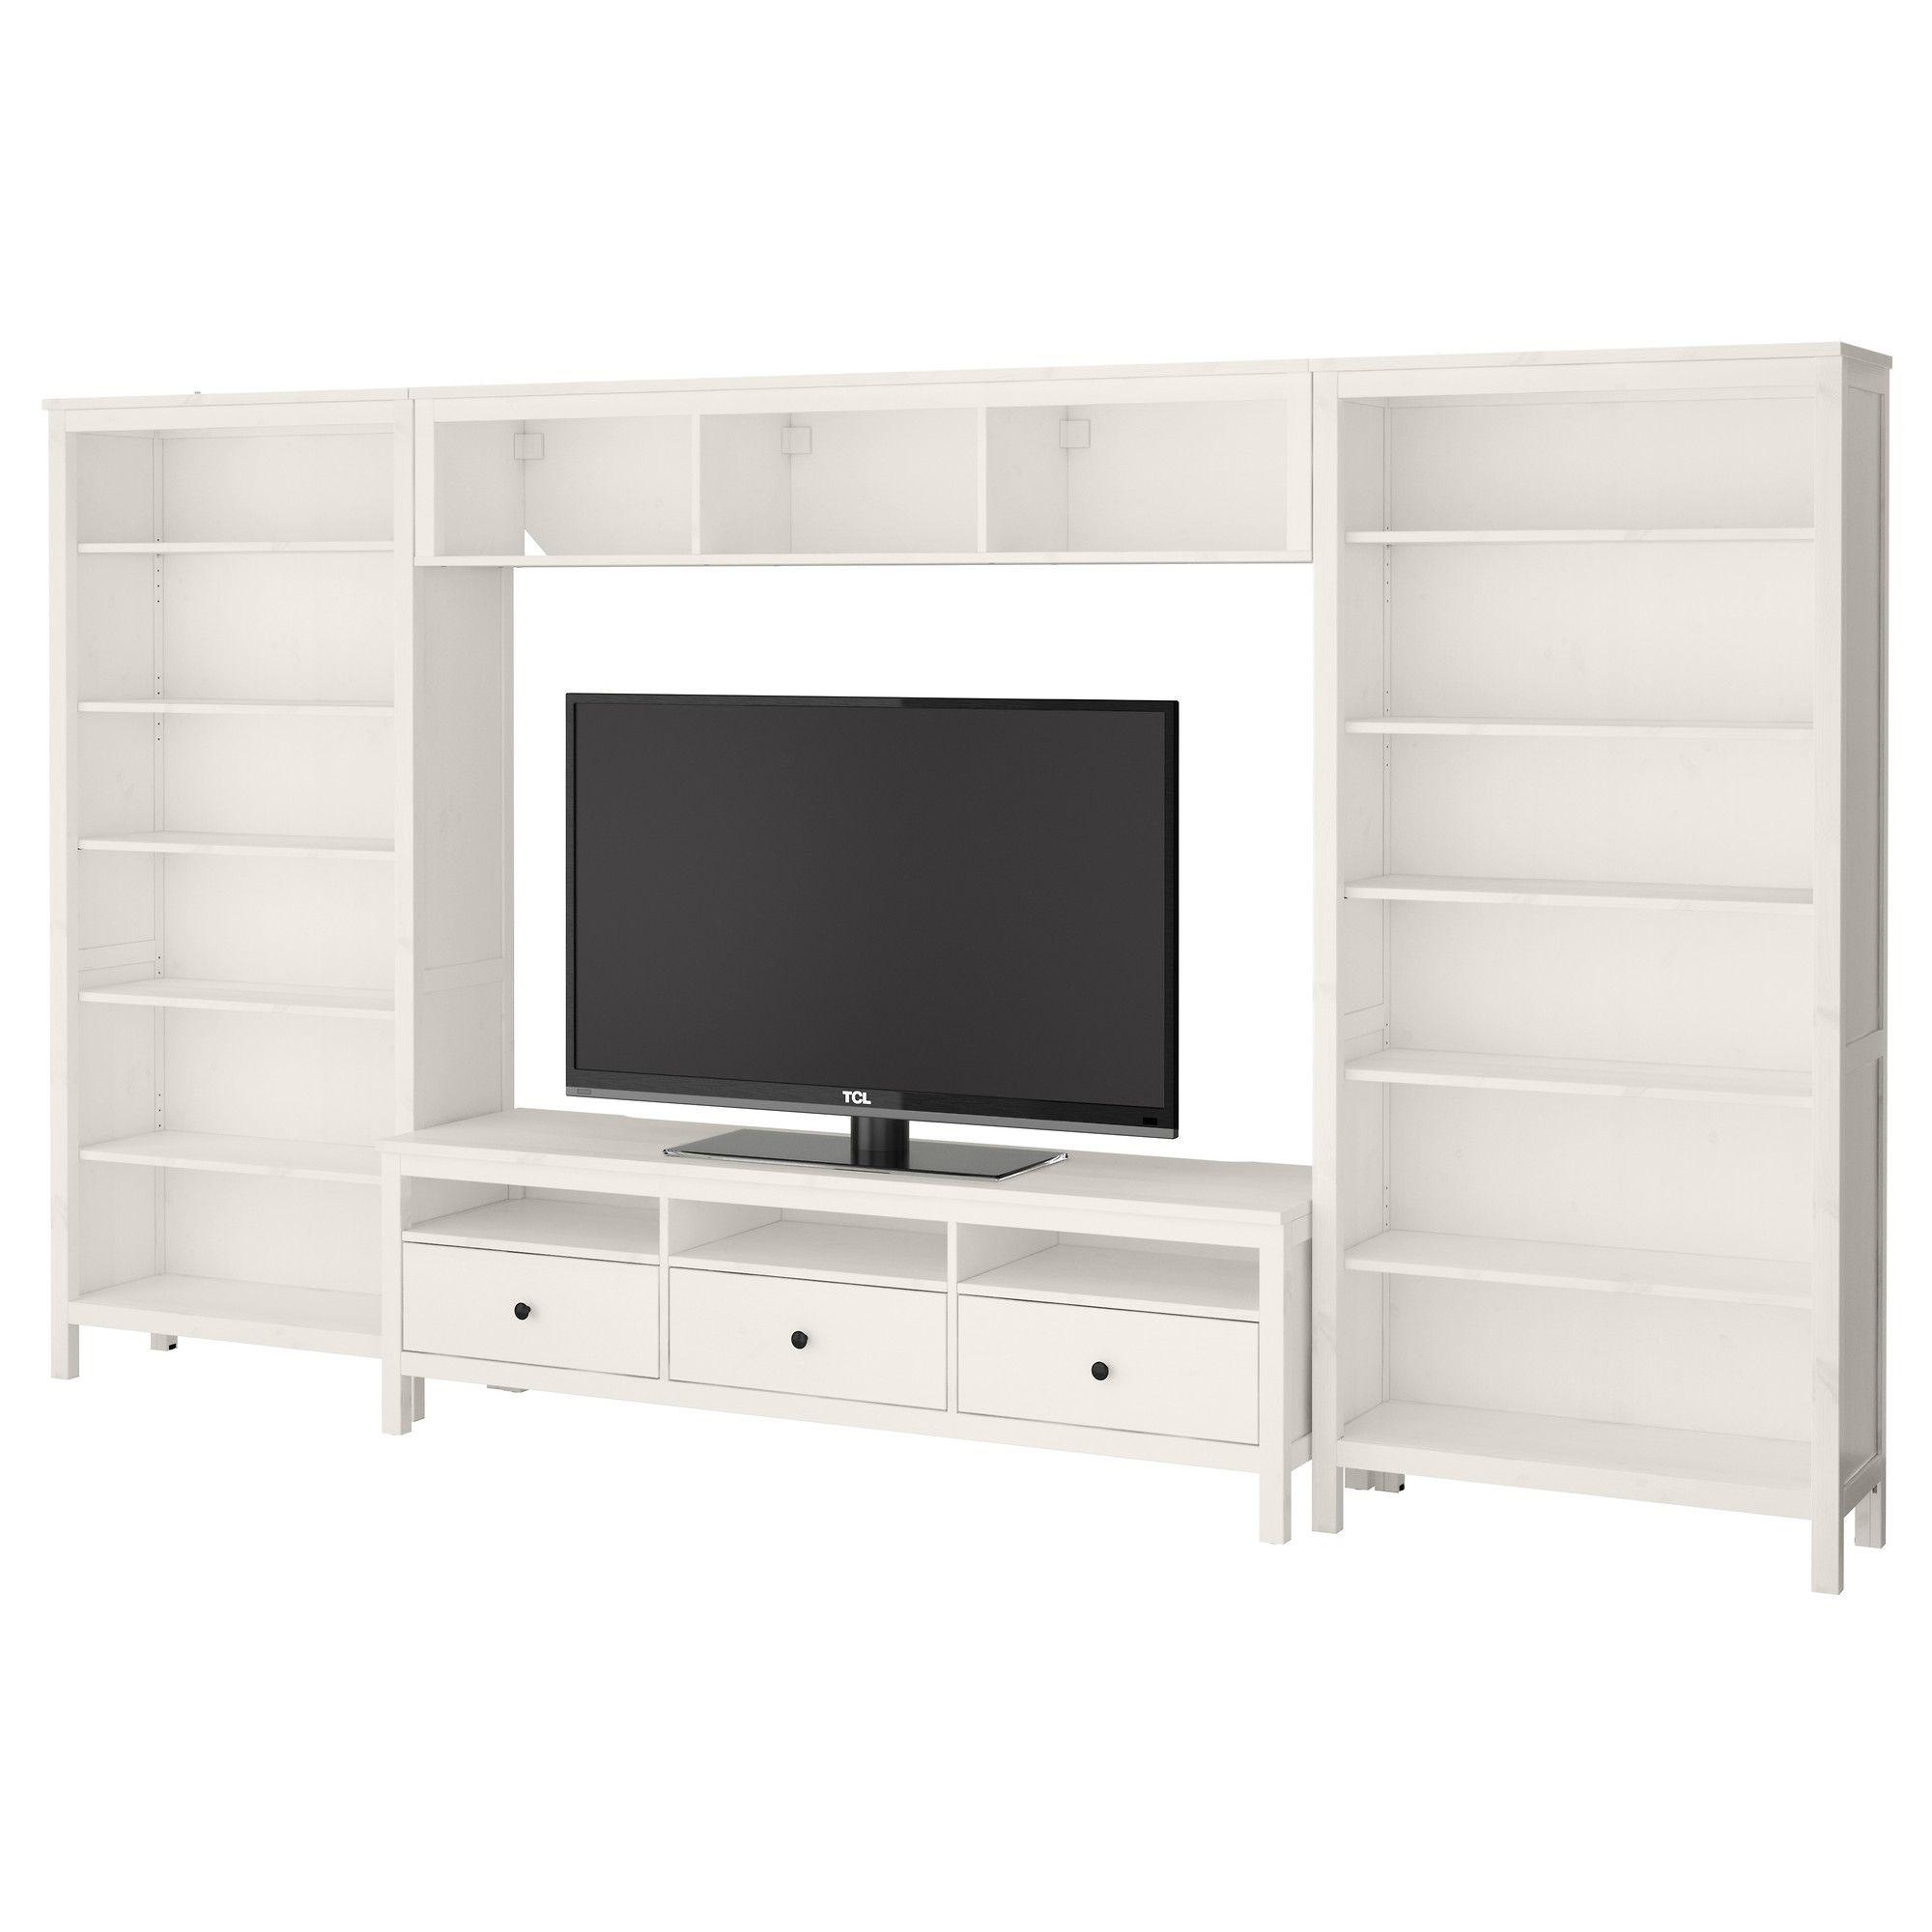 Us Furniture And Home Furnishings Tv Storage Home Hemnes